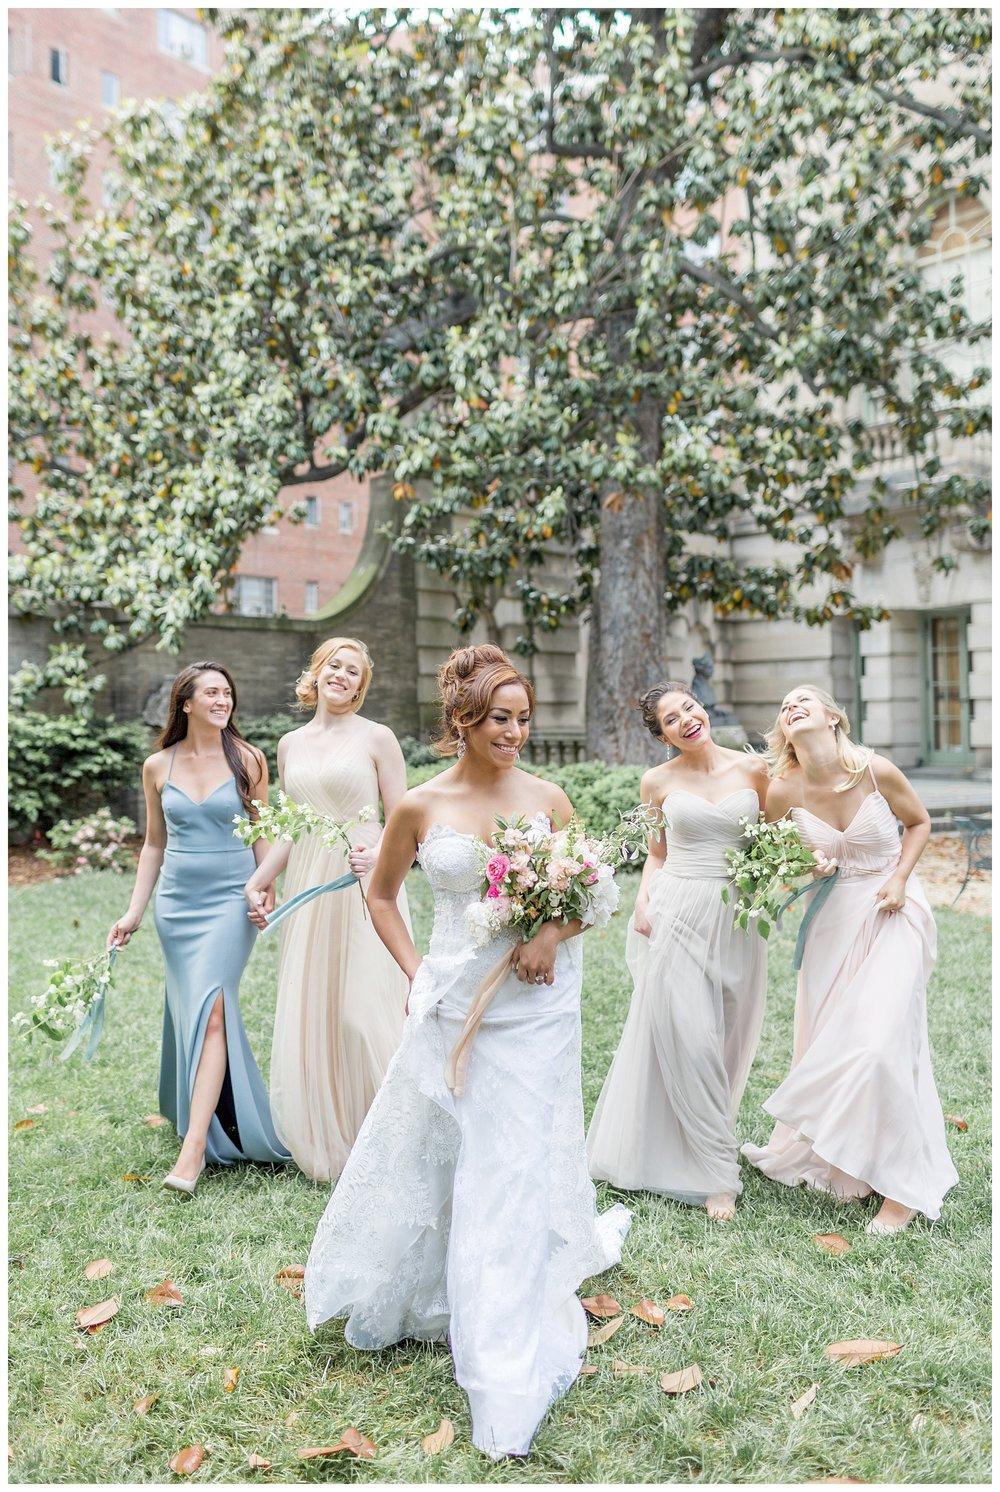 Anderson House Wedding DC Wedding Photographer Kir Tuben_0021.jpg